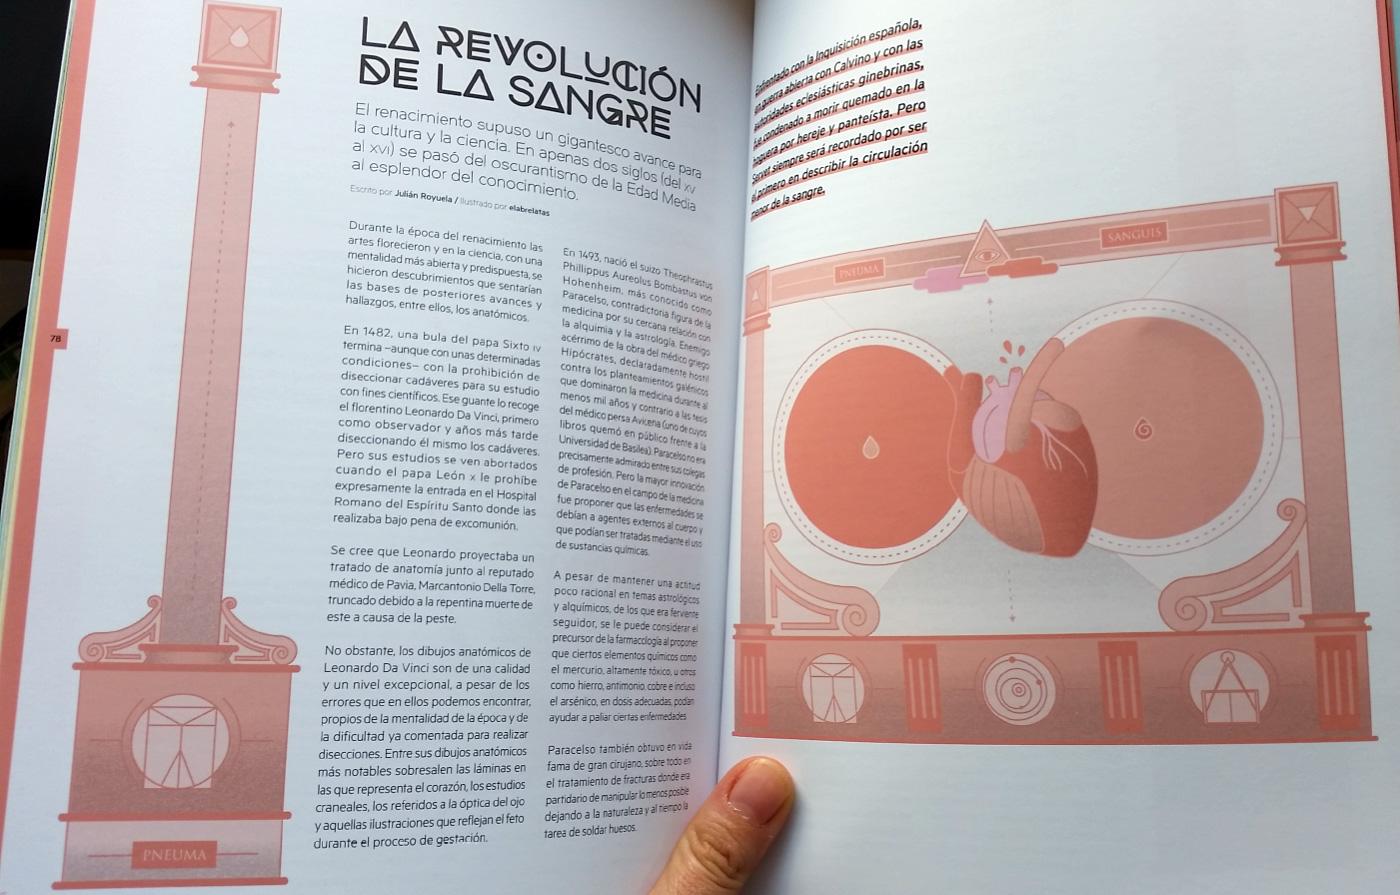 revolution,blood,draw,Principia,magazine,article,science,Renaissance